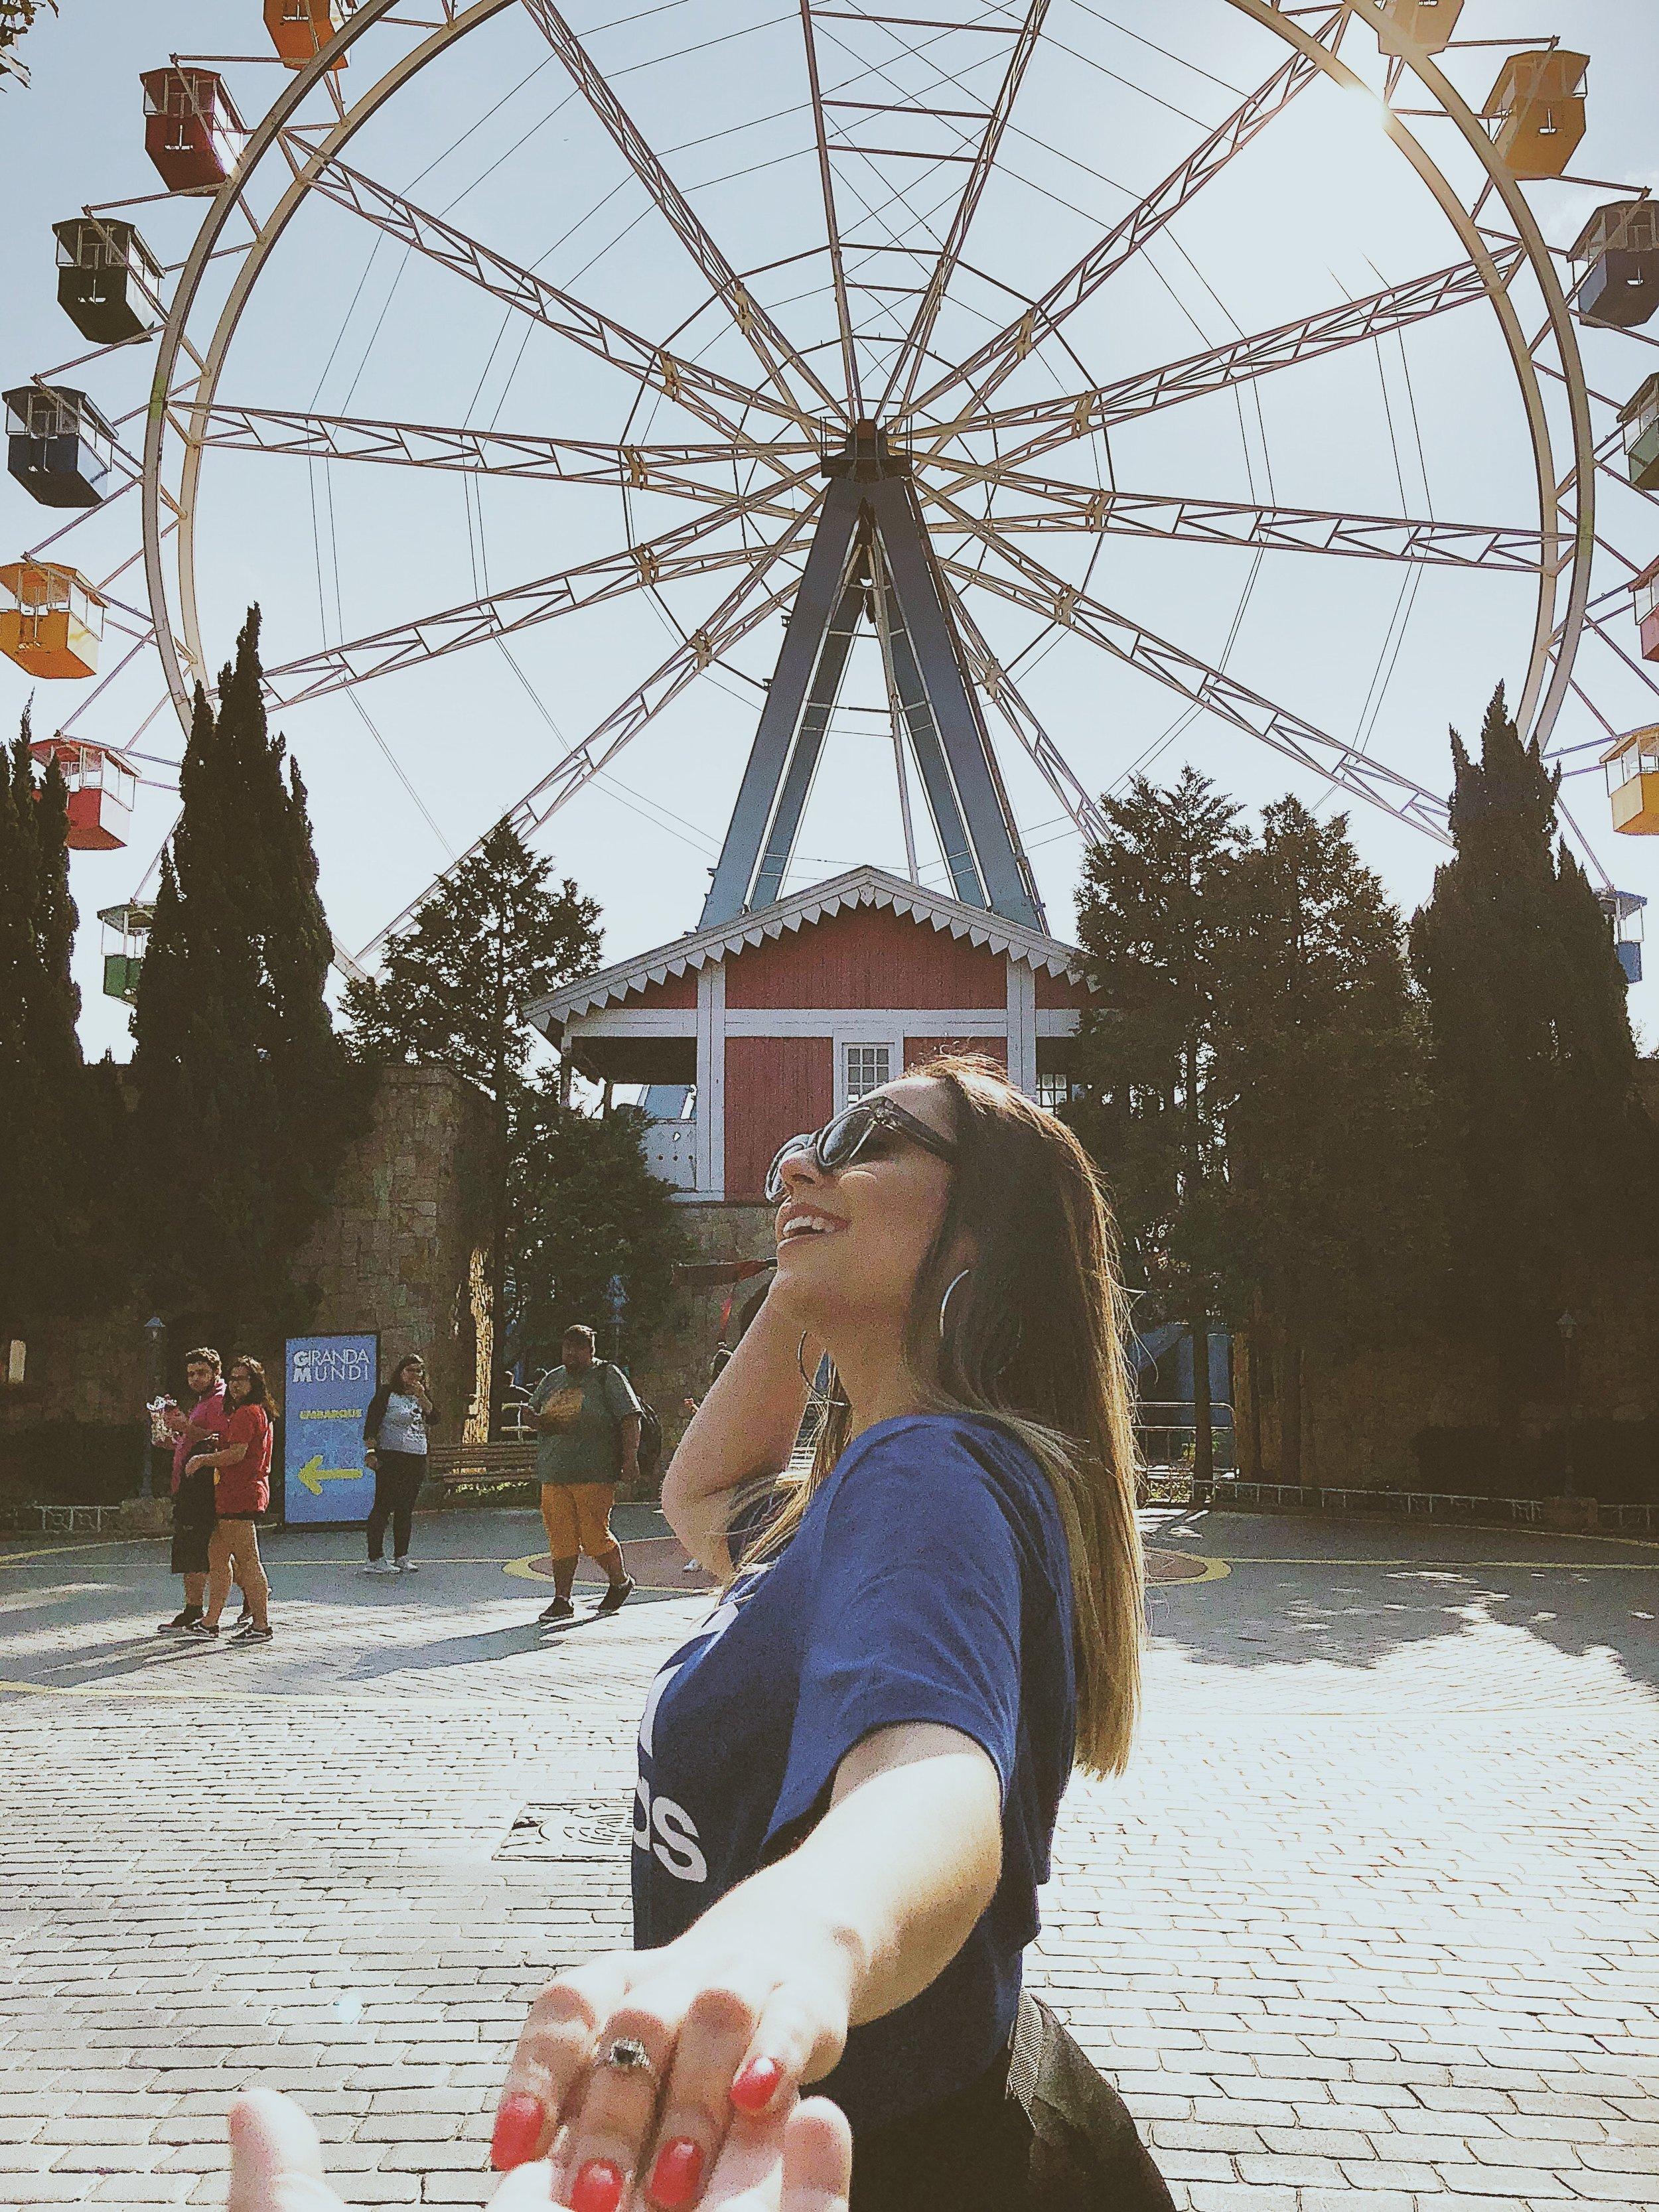 amusement-park-daylight-fashion-1660707.jpg